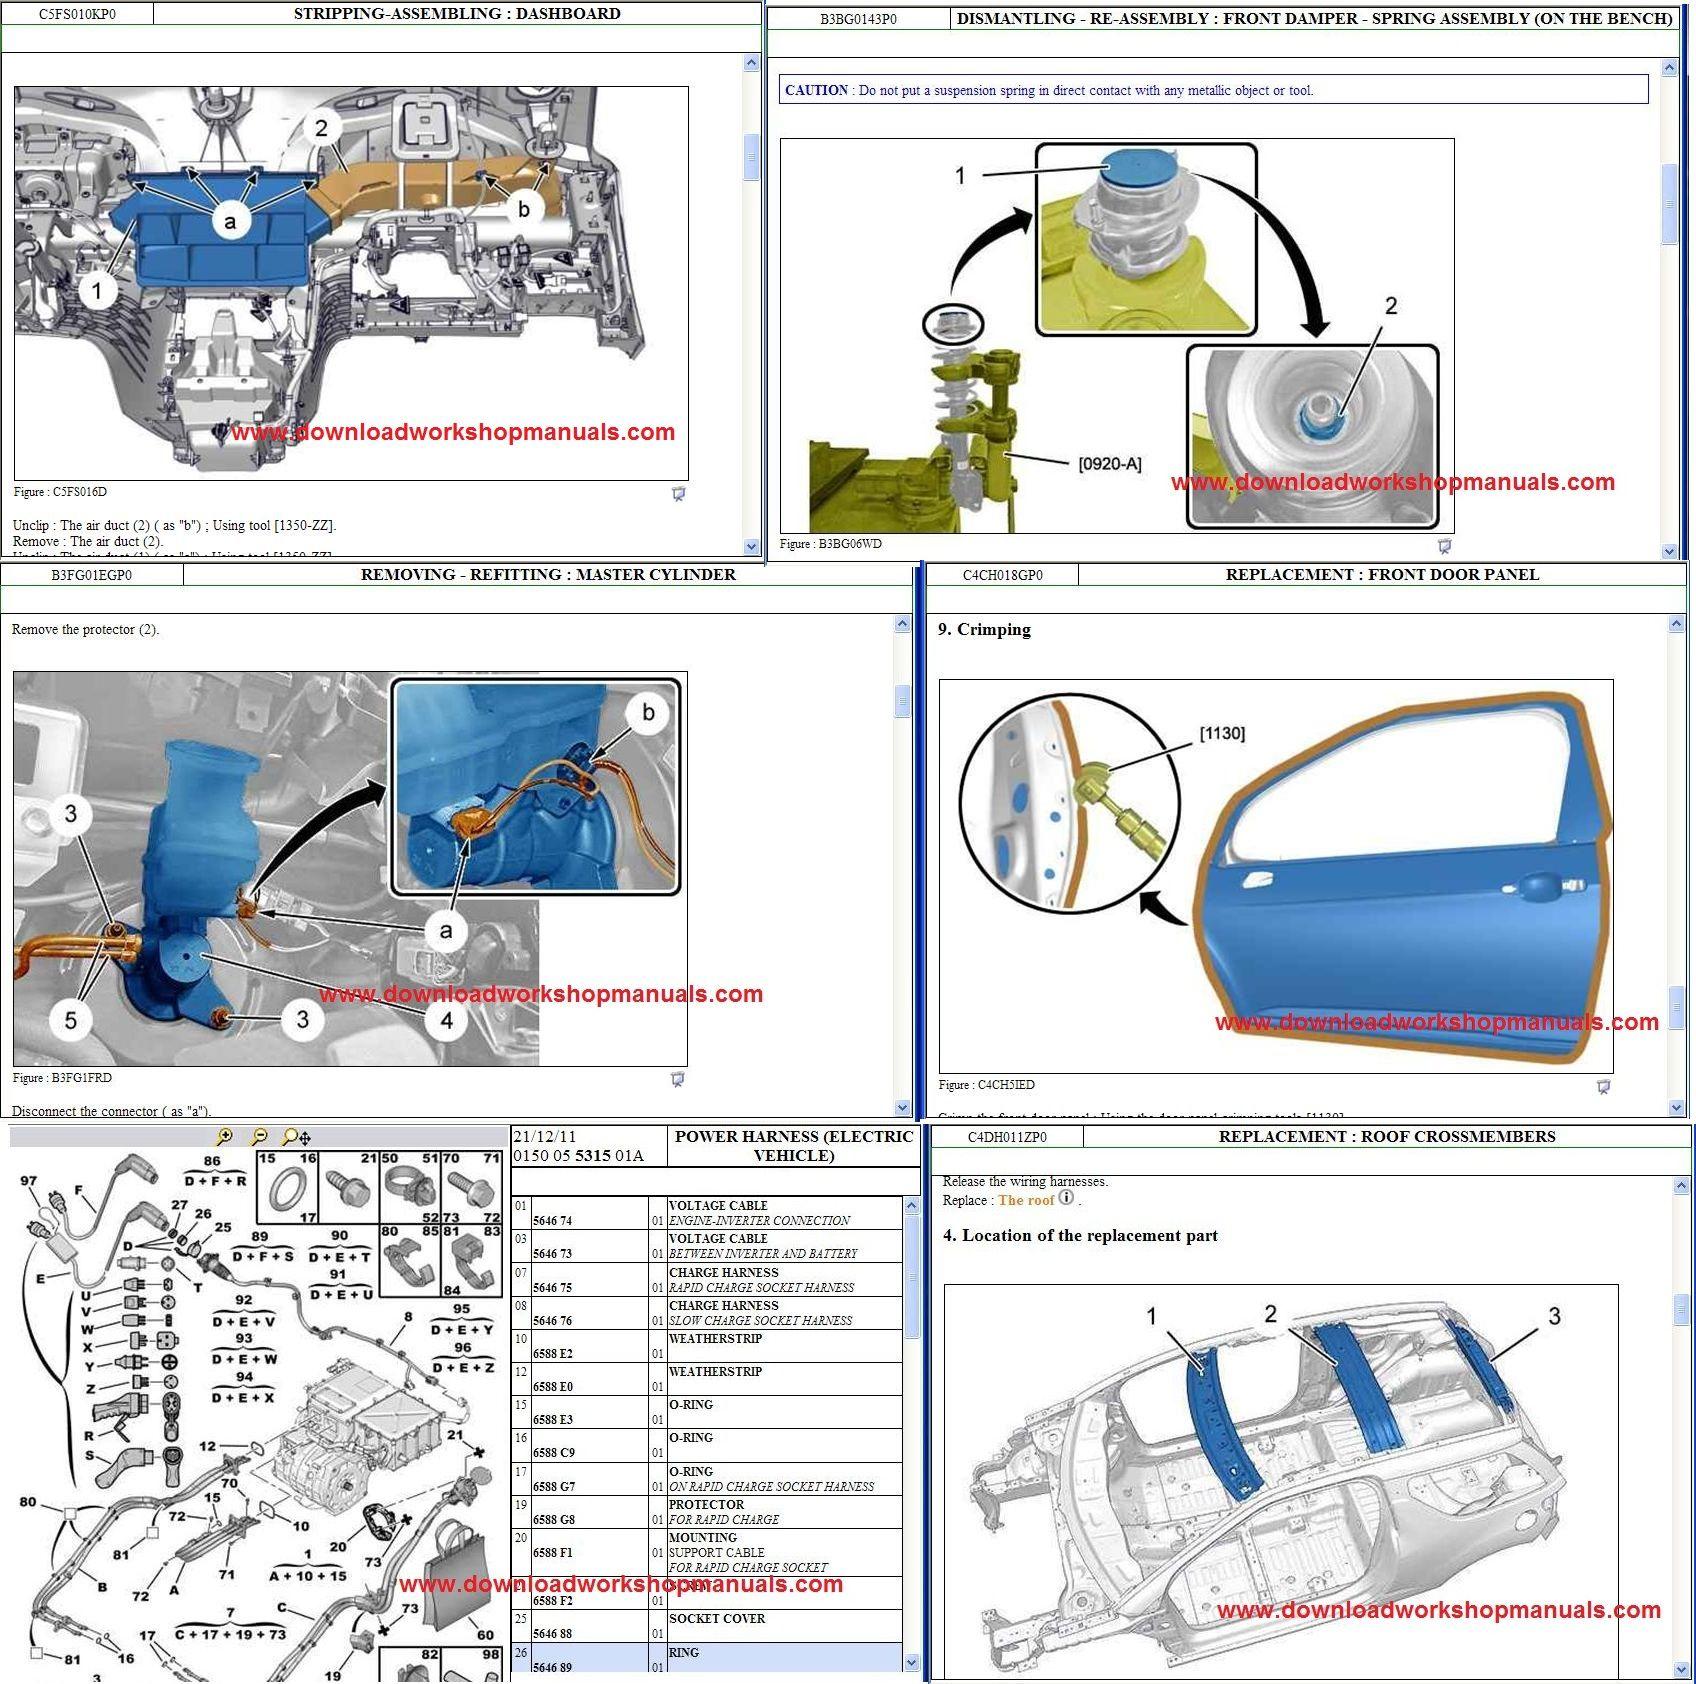 Citroen Synergie Wiring Diagram - Nissan Car Radio Wiring Diagram -  vw-t5.yenpancane.jeanjaures37.fr | Citroen Synergie Wiring Diagram |  | Wiring Diagram Resource